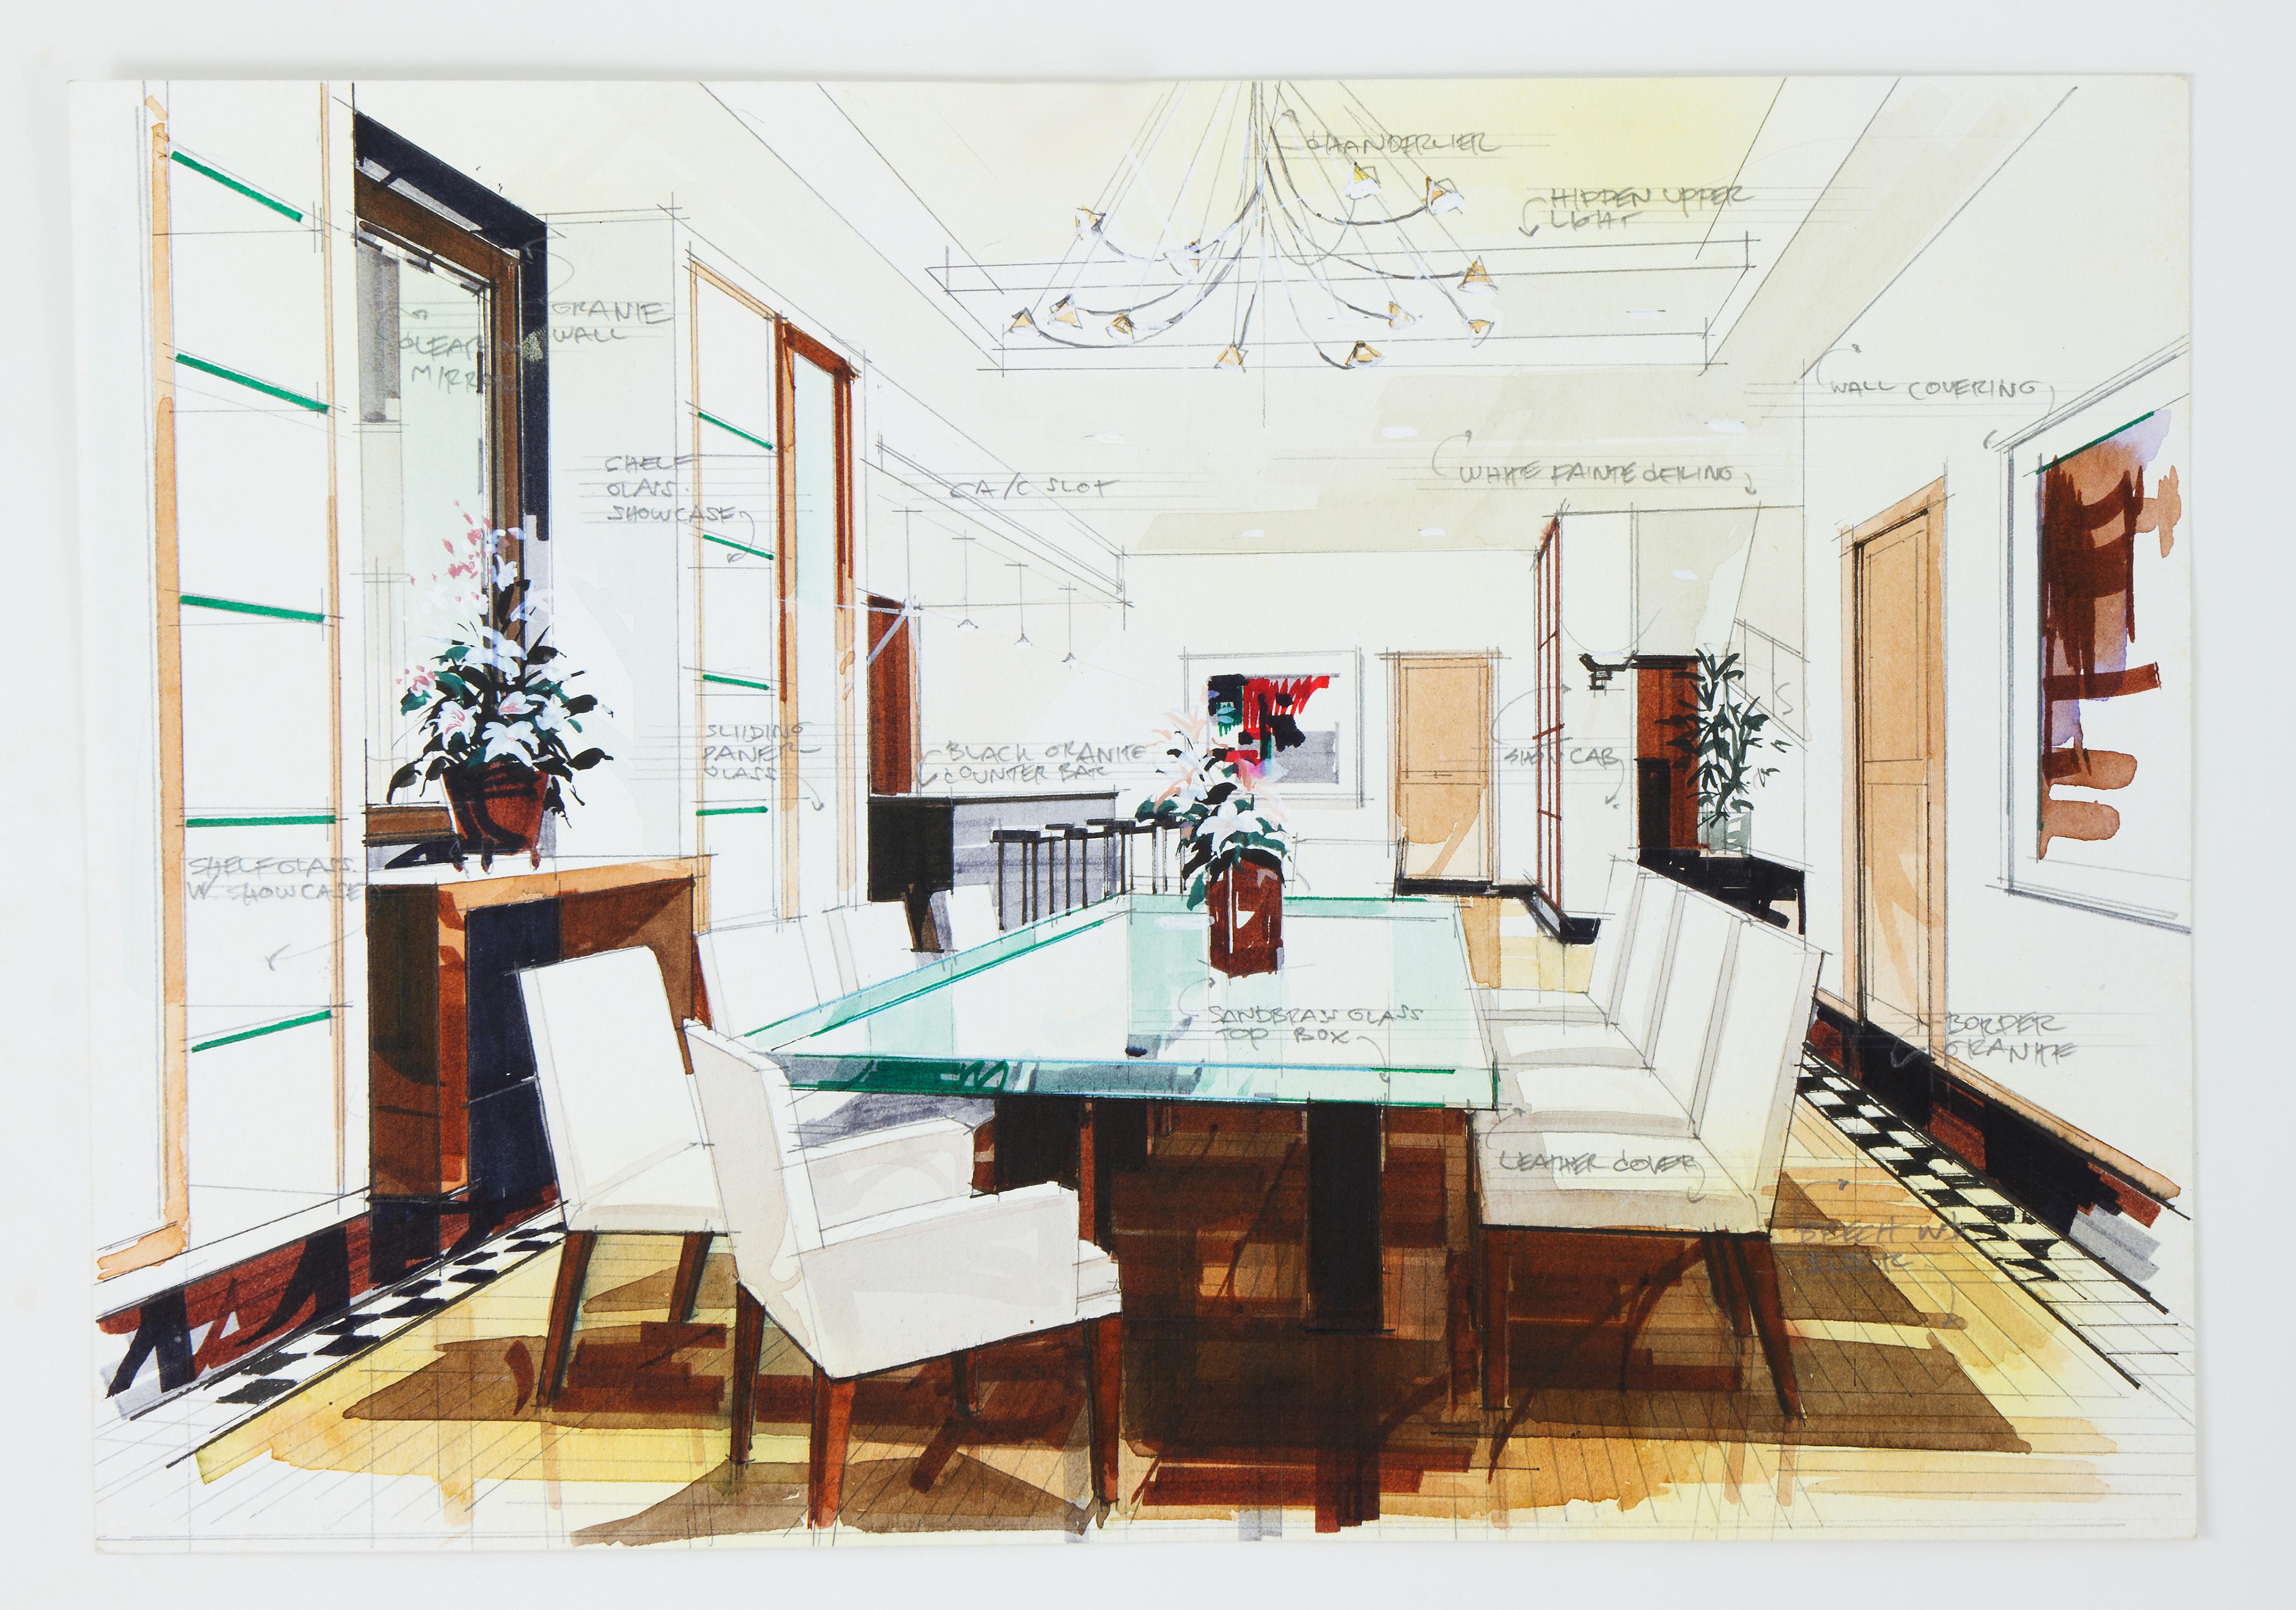 Domo intel diy home improvements for Interior design dining room 2015